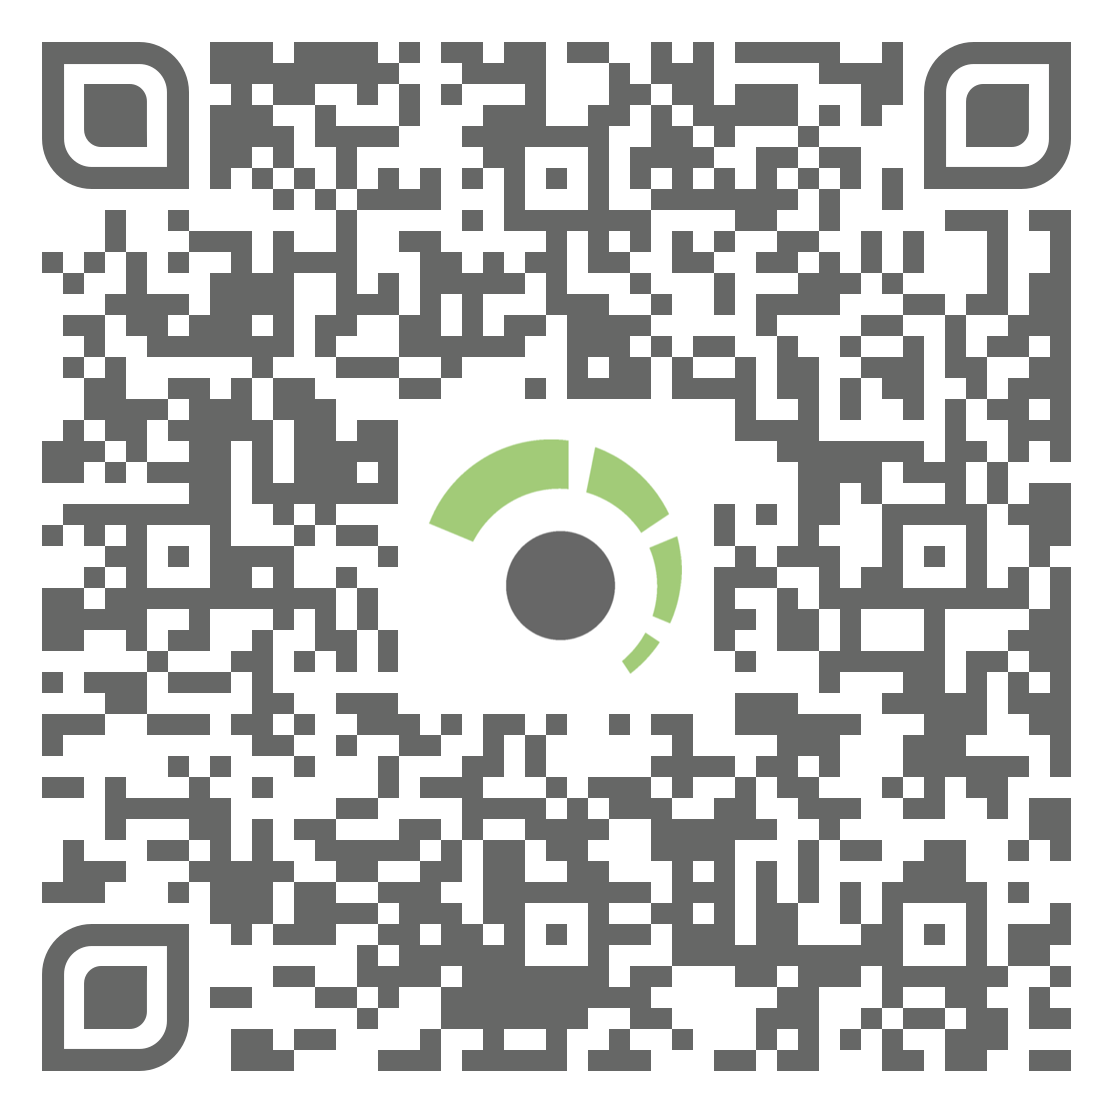 https://xd.adobe.com/view/9fede6c7-6cf0-470a-5d5c-6aae21741e23-e9dc/